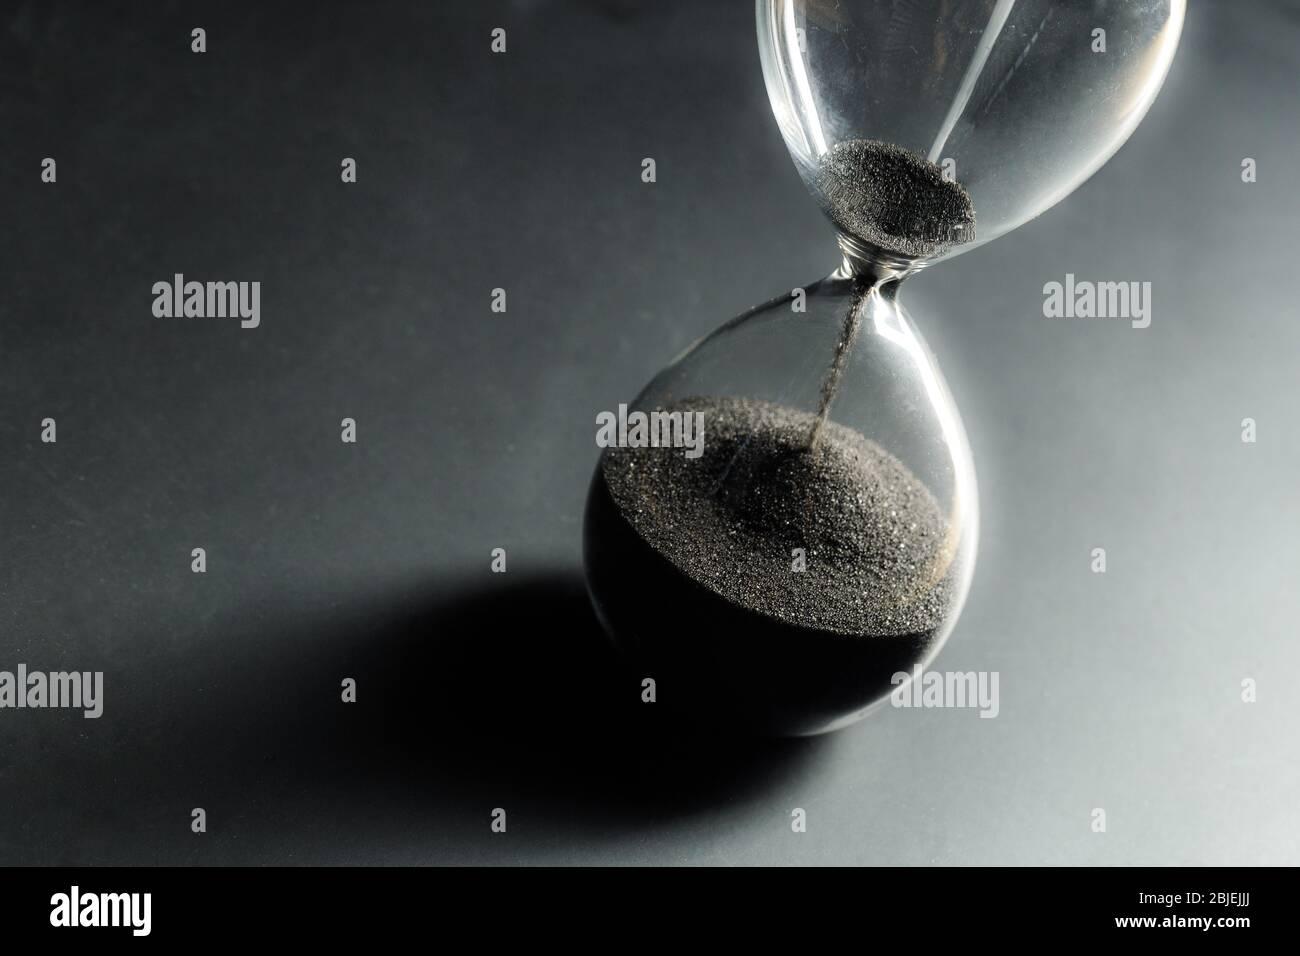 Reloj de arena sobre fondo oscuro. Foto macro. Primer plano. Foto de stock